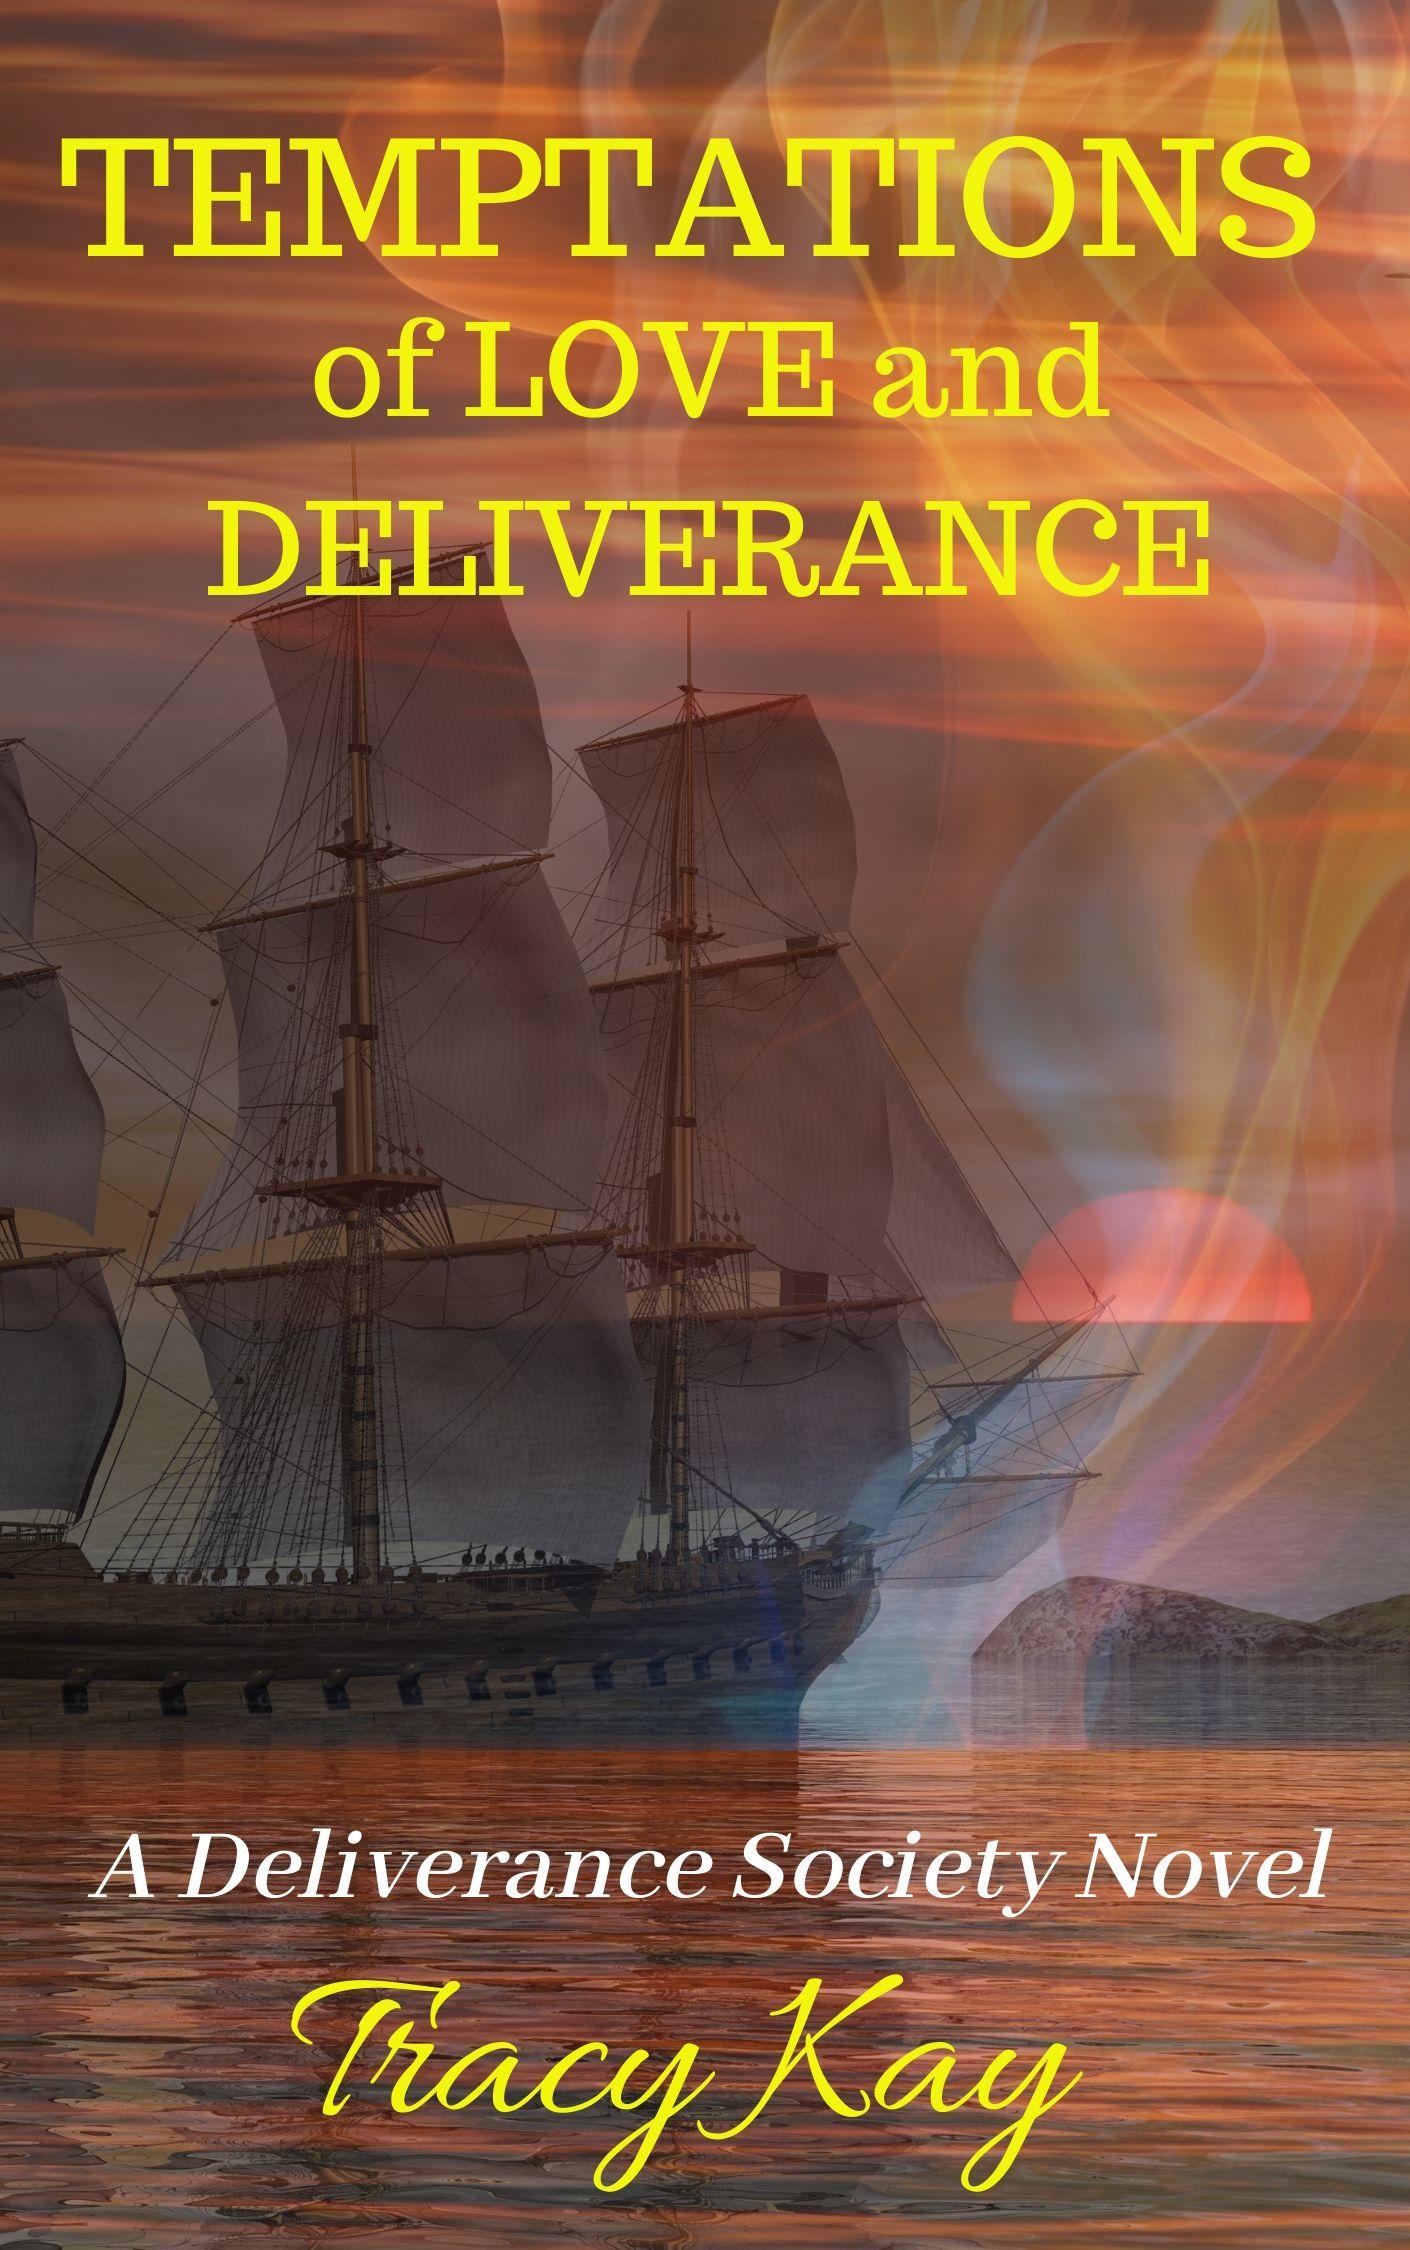 Temptations Ebook cover CL1CP5Final